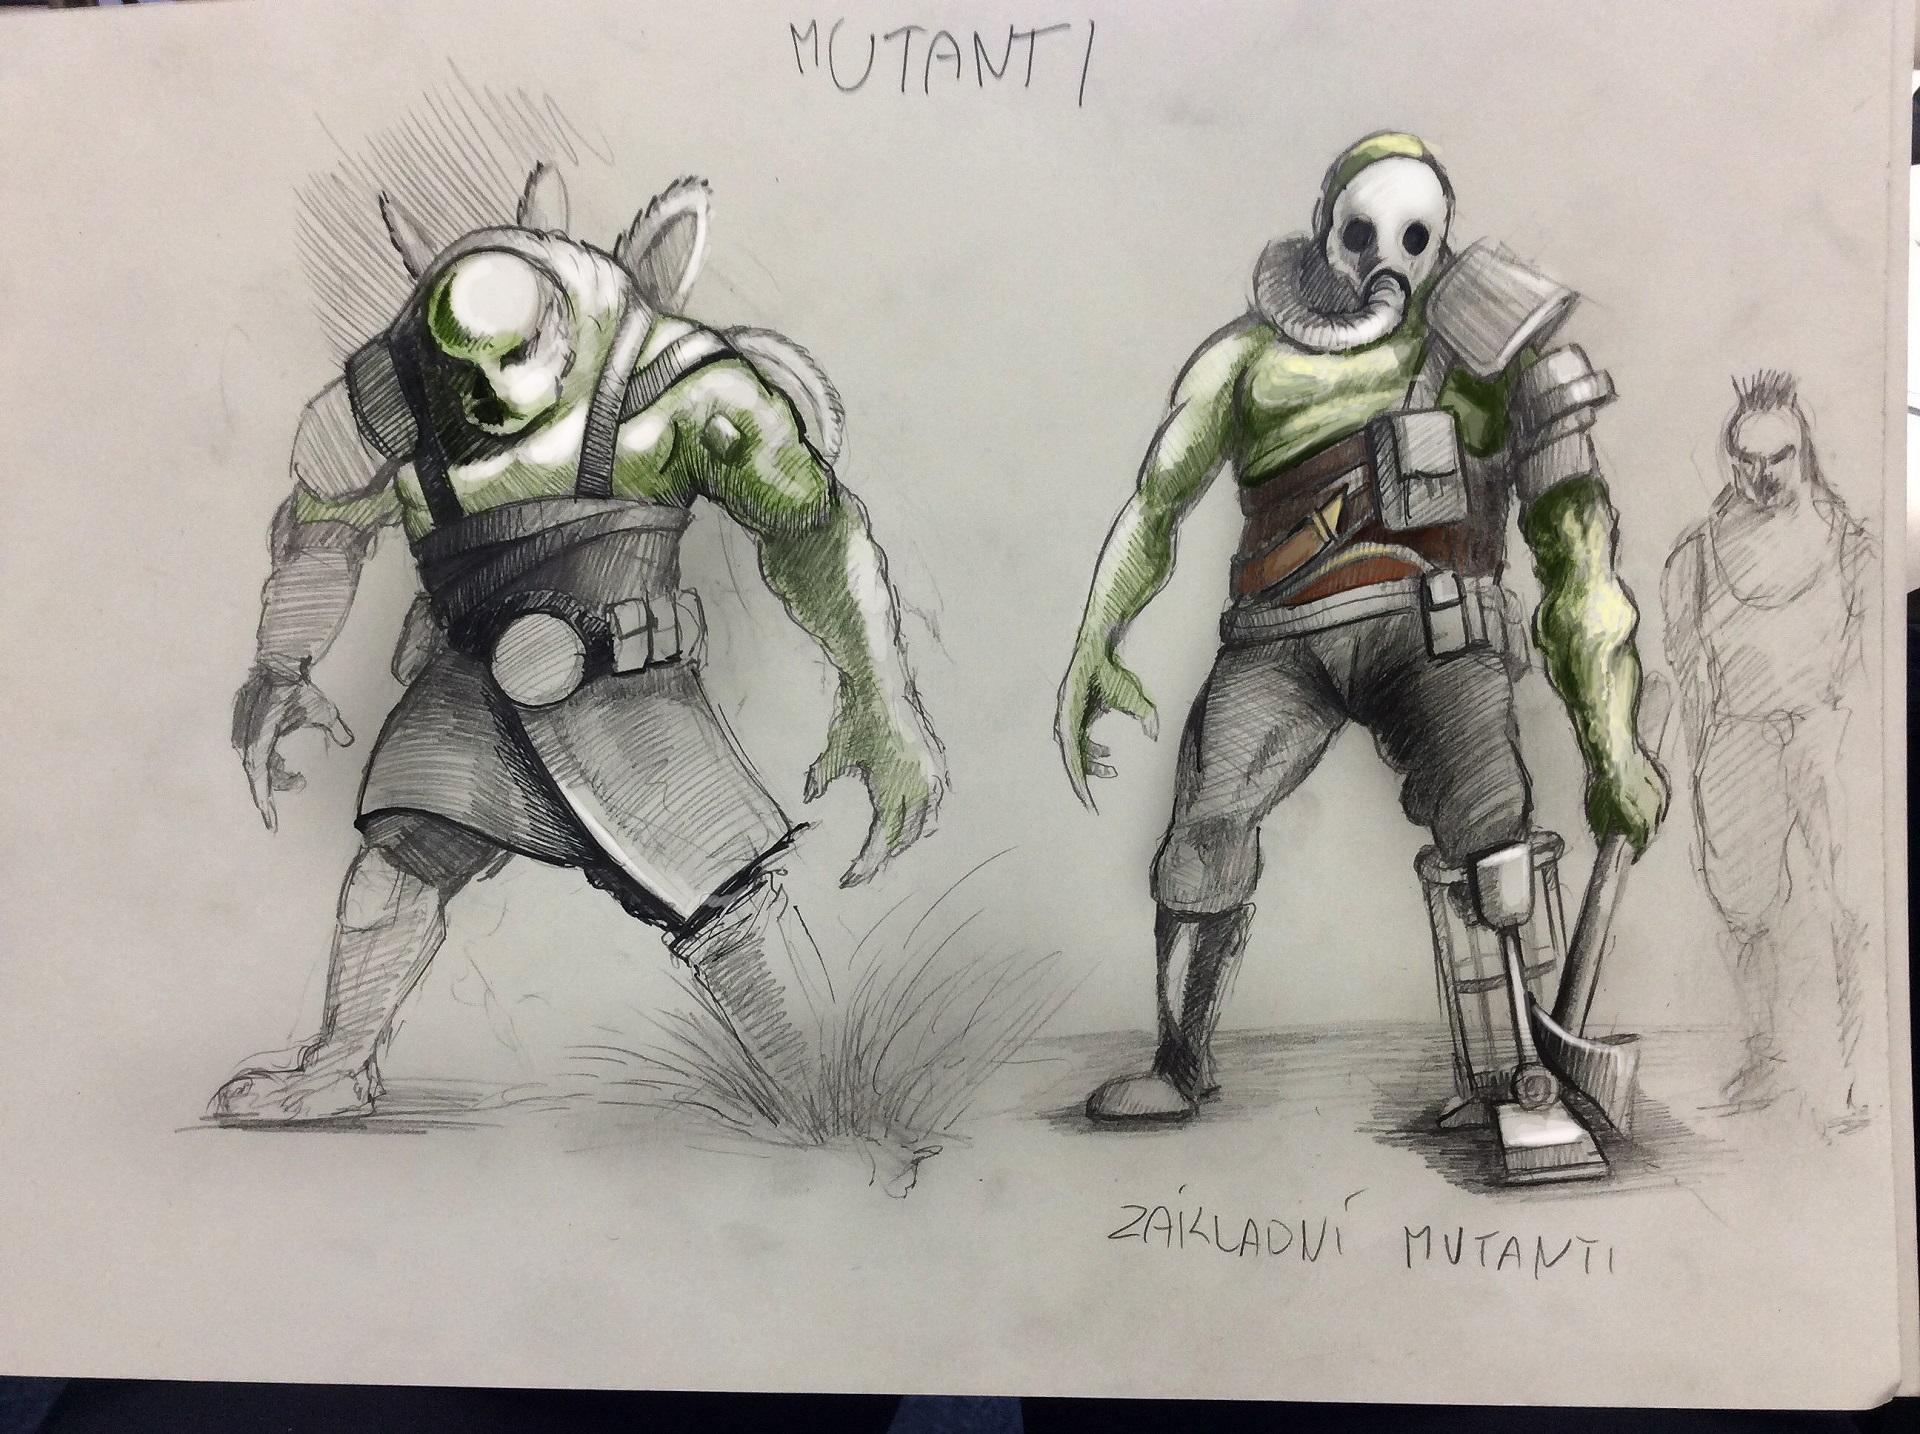 Mutants Green